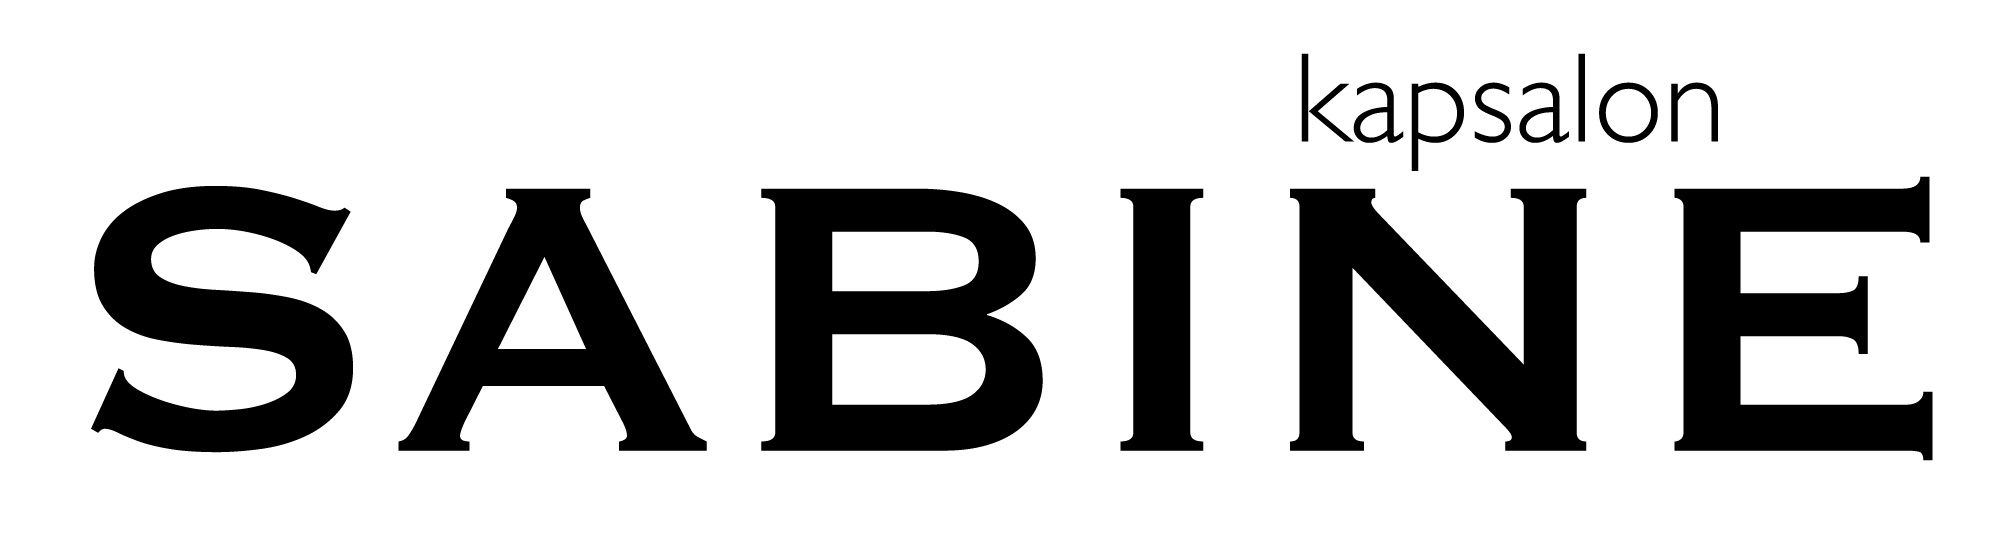 Kapsalon Sabine